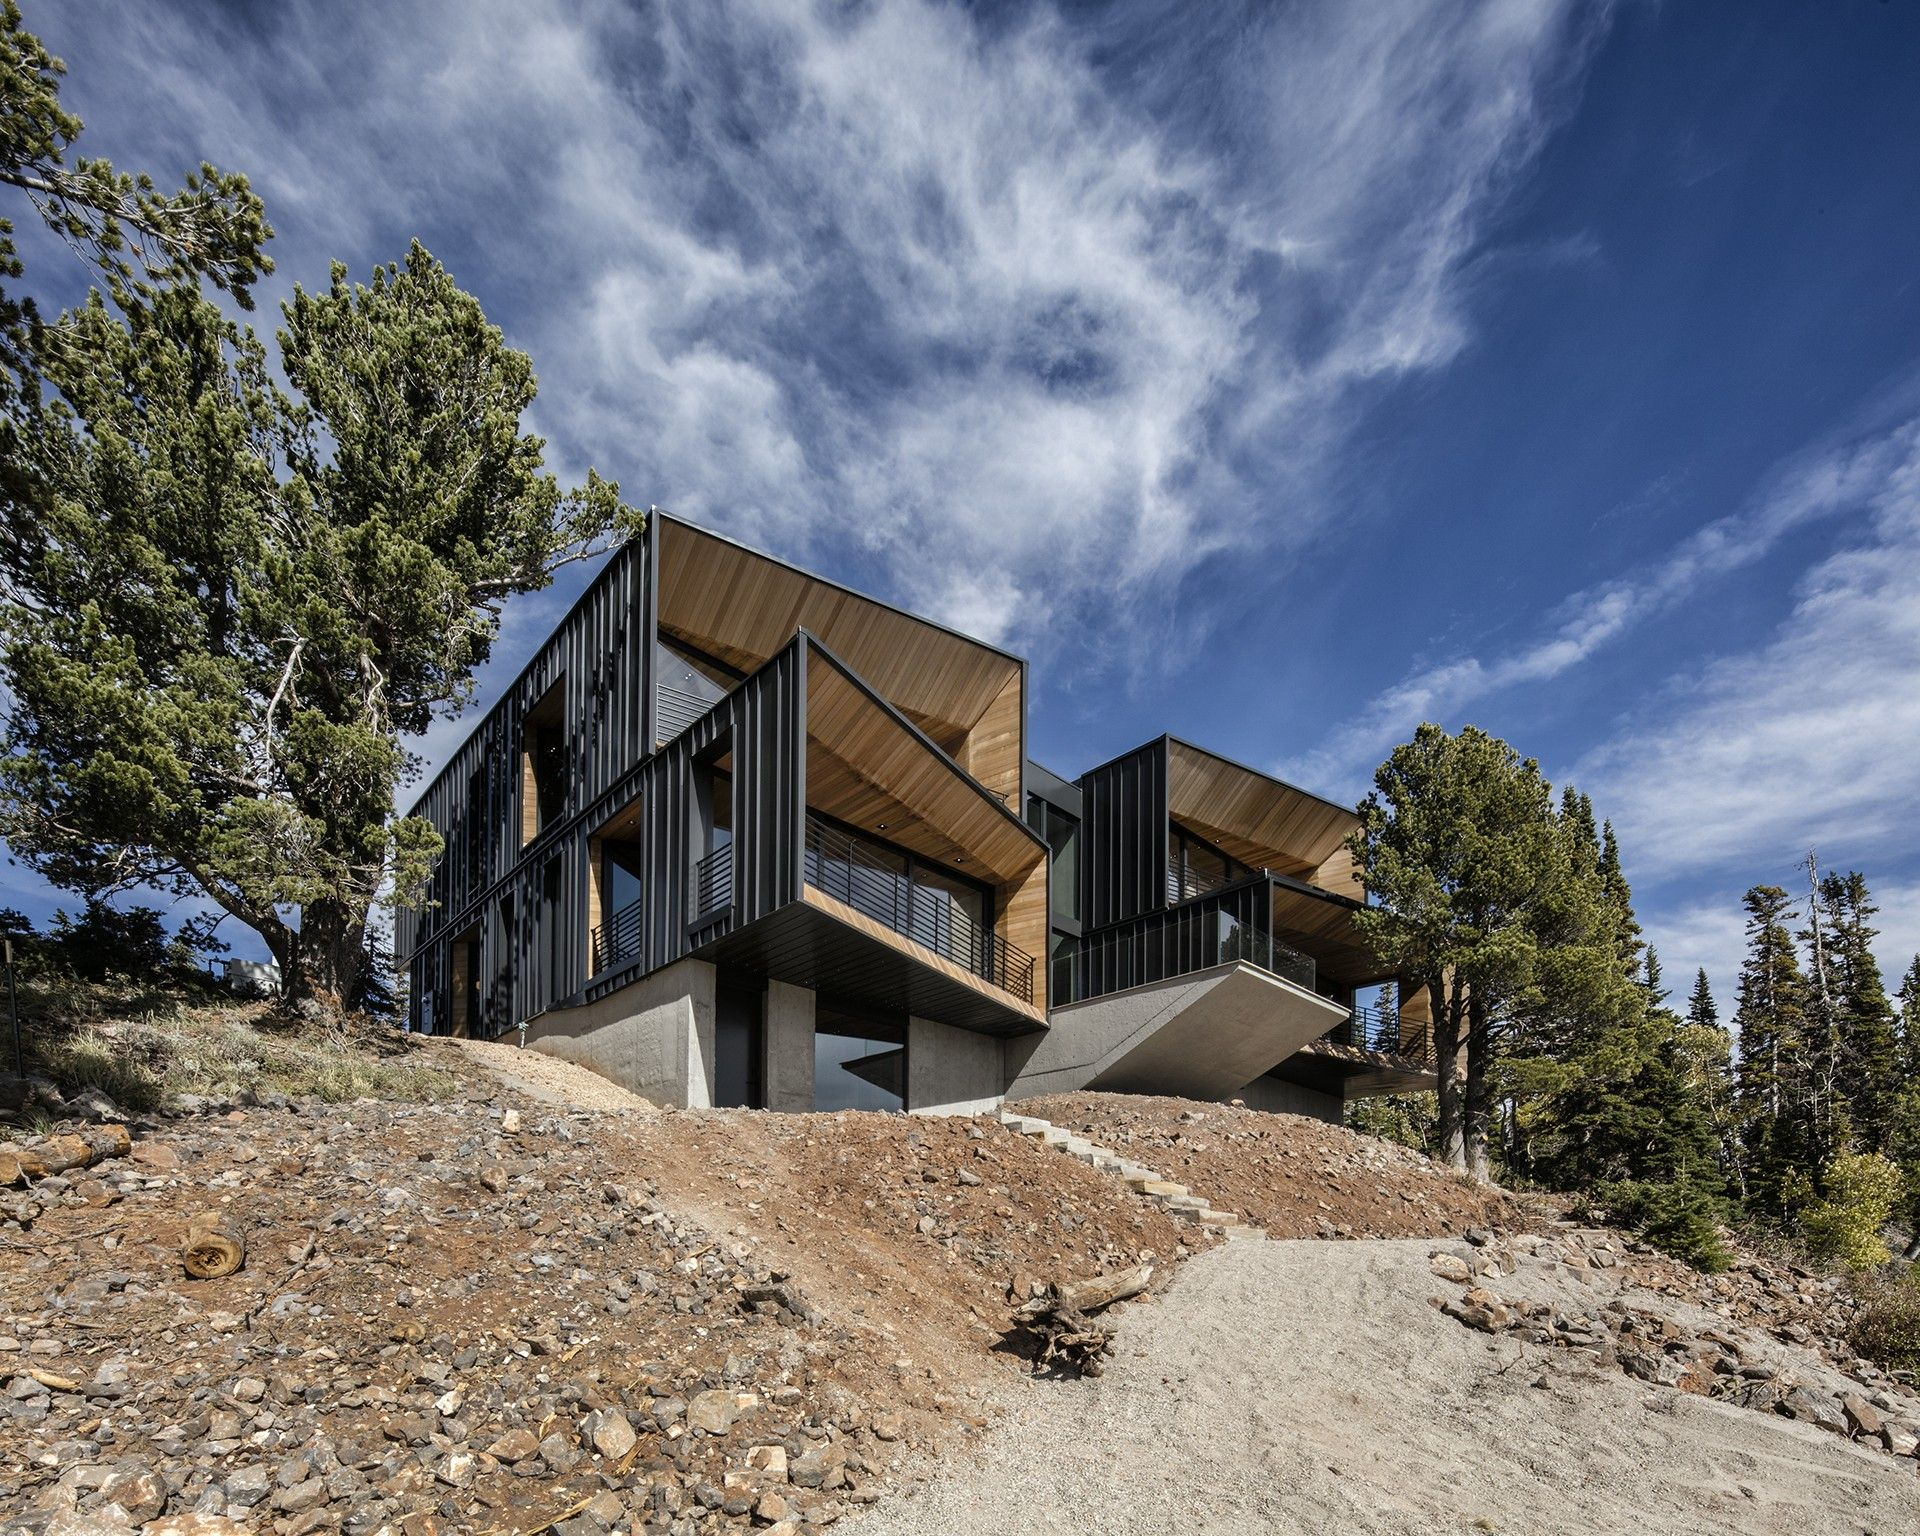 The Kinii The Falcon S Nest By The Italian Architects Of Obicua